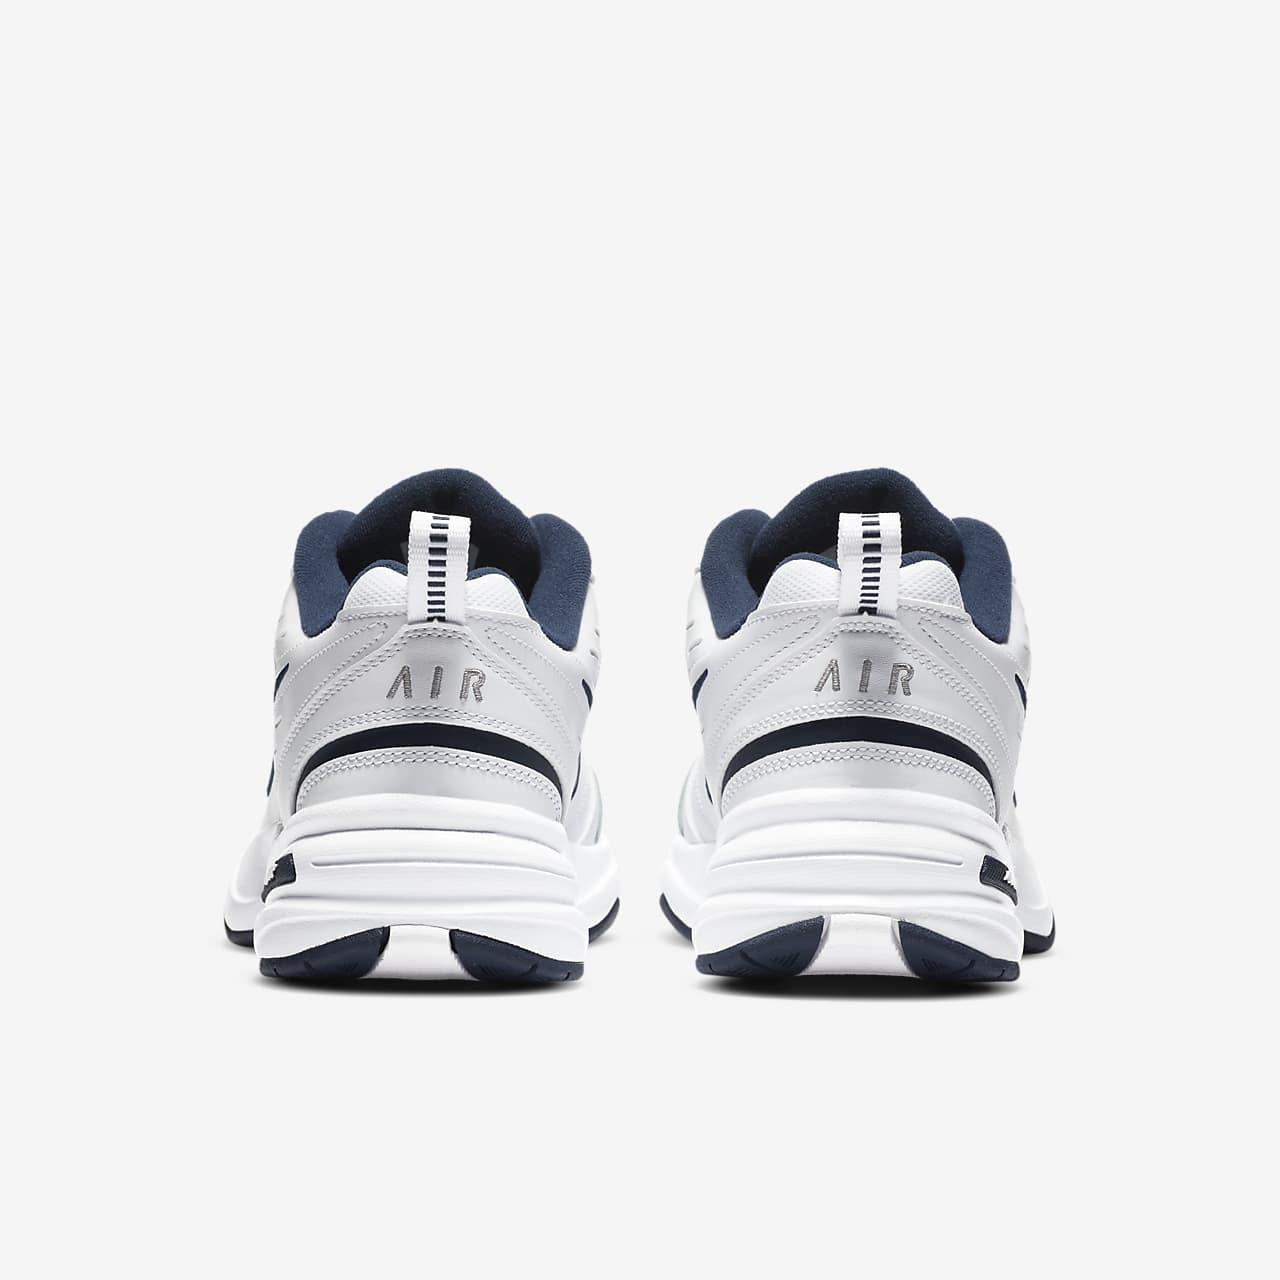 pretty nice 7d1e9 e9bed ... Chaussure de fitness et lifestyle Nike Air Monarch IV